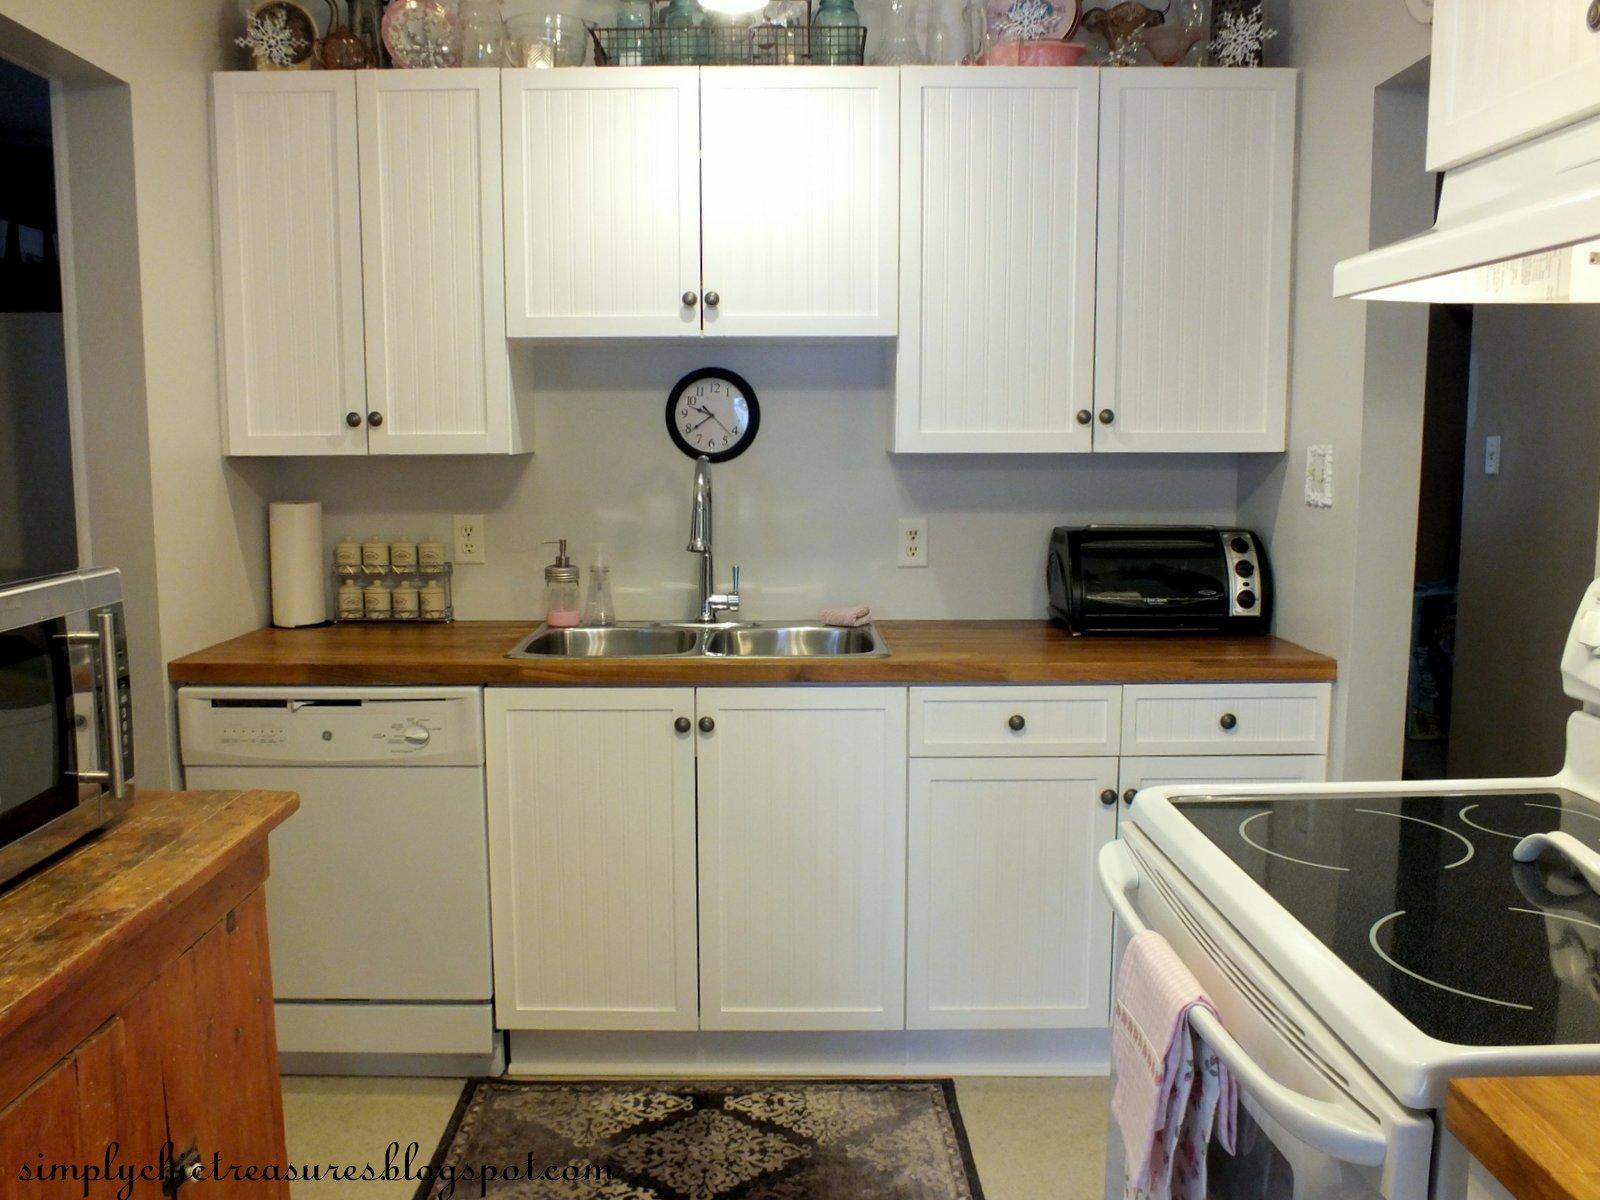 Best Kitchen Gallery: Melamine Cabi Doors Makeover Redglobalmx Org of Kitchen Flat Cabinets Door Makeover on cal-ite.com